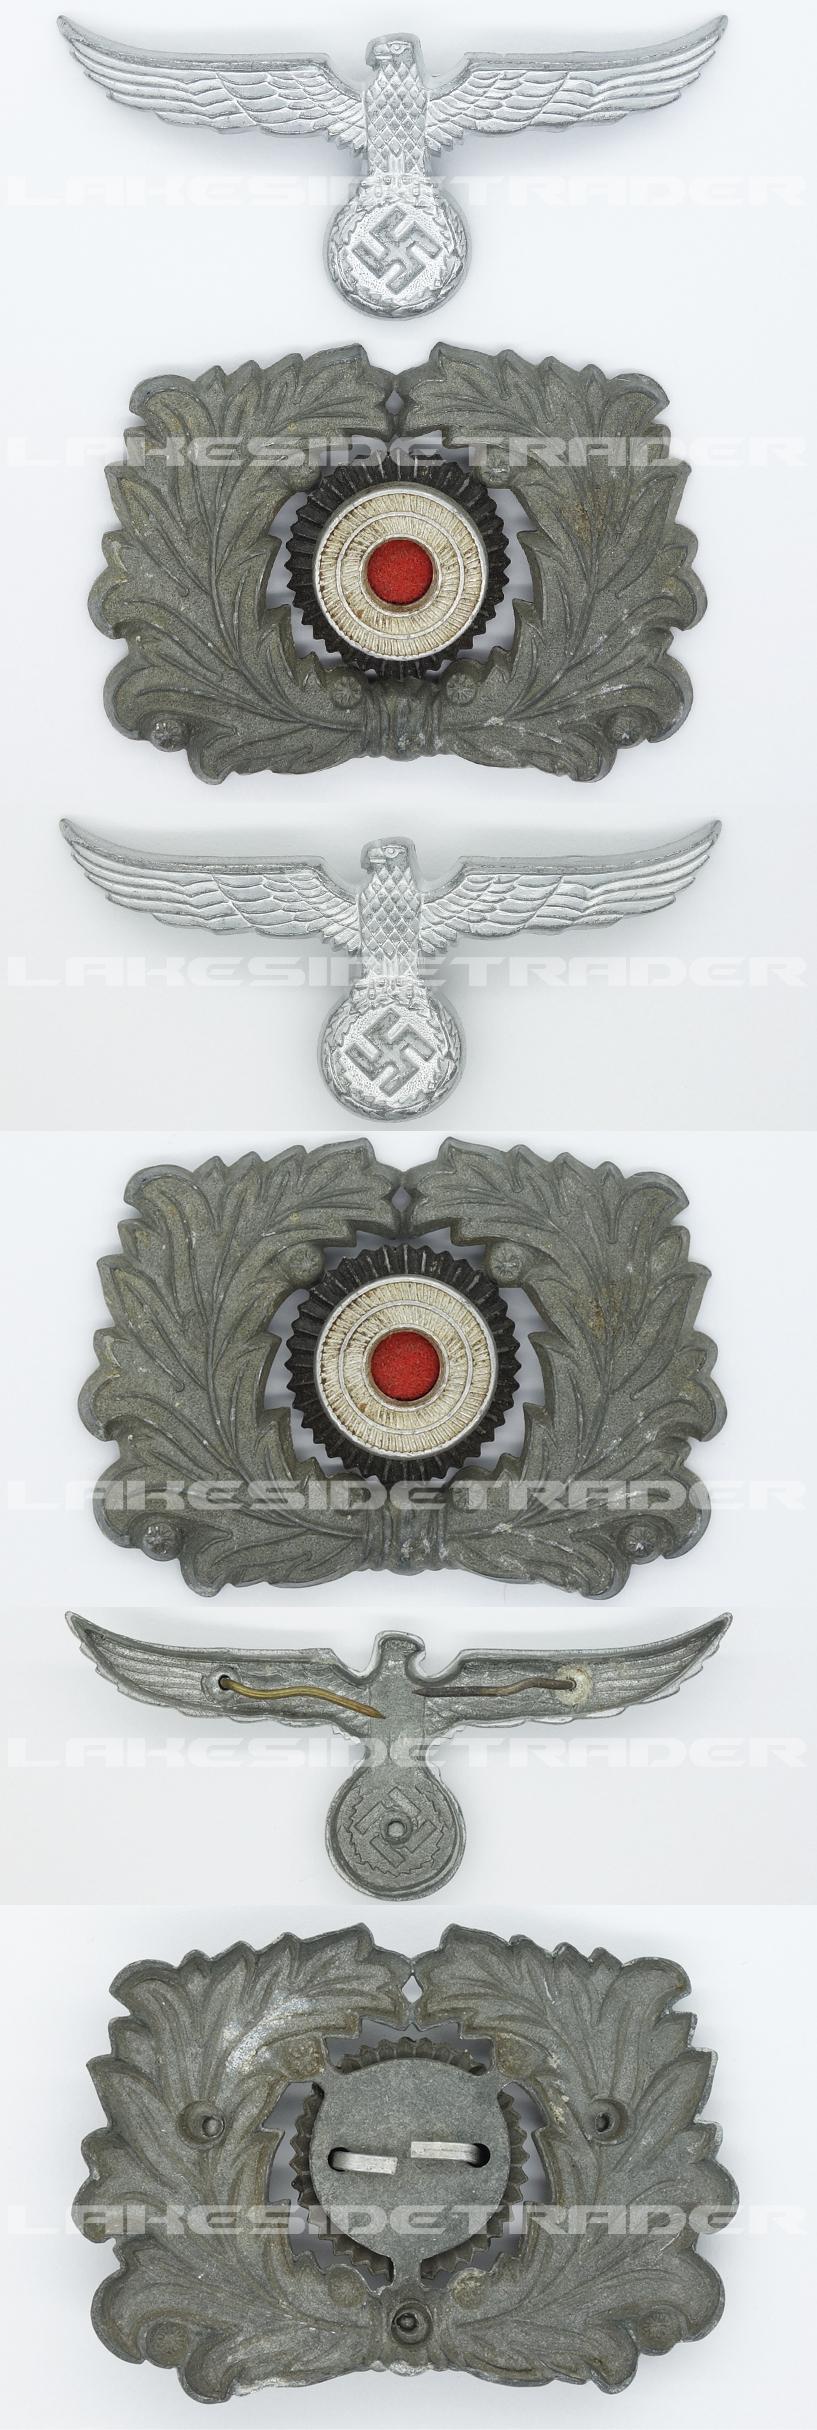 Customs Visor Cap Eagle and Cockade